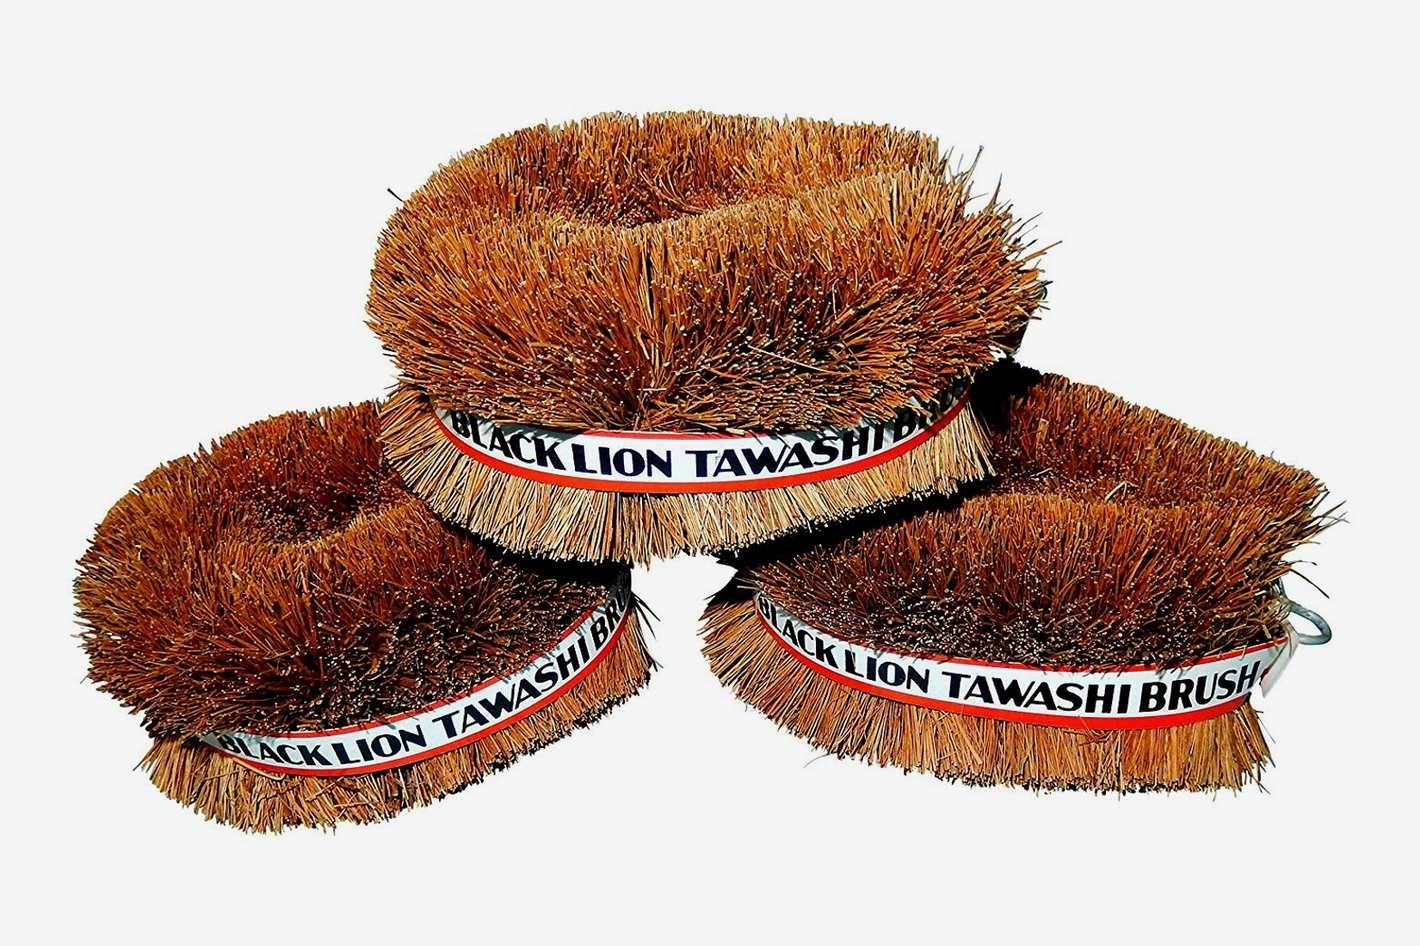 Japanese Tawashi Brushes for Cleaning, Set of 3